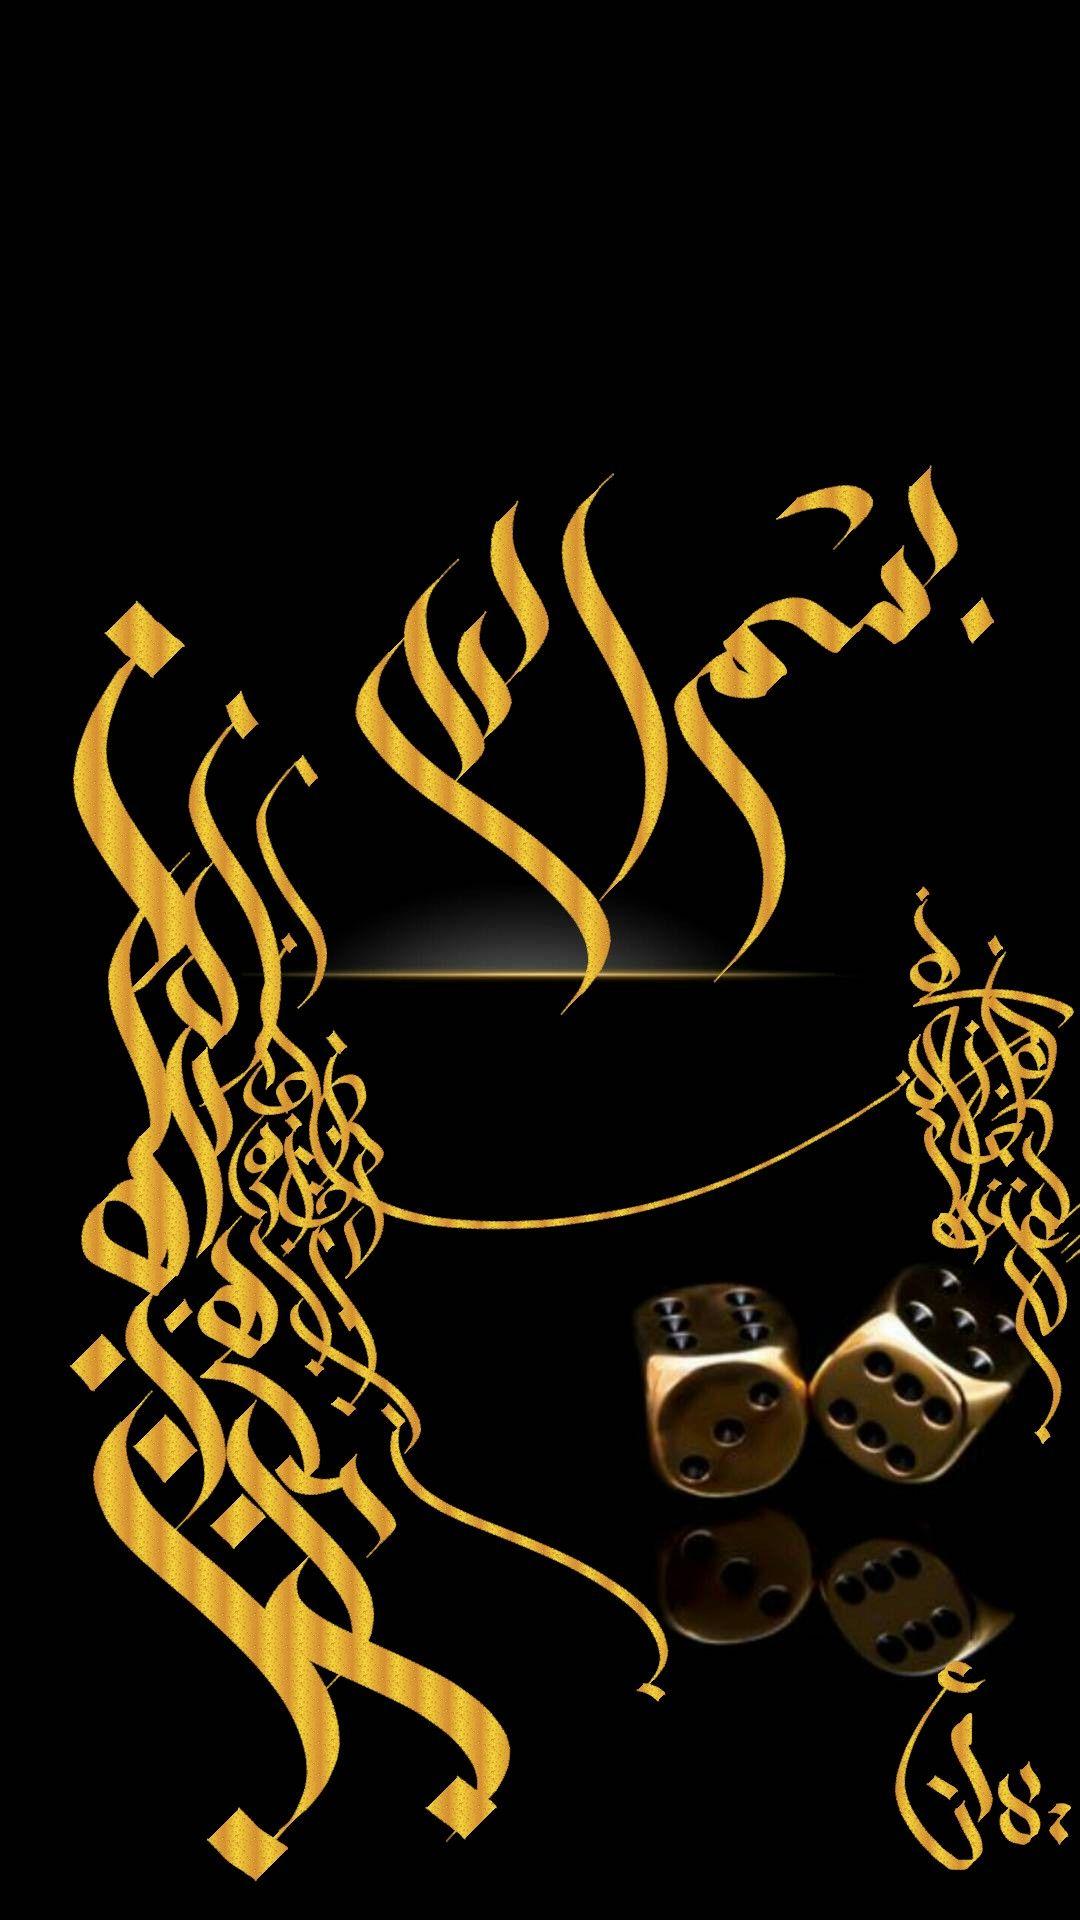 خلفيات هاتف بالخط العربي Arabic Calligraphy Neon Signs Calligraphy